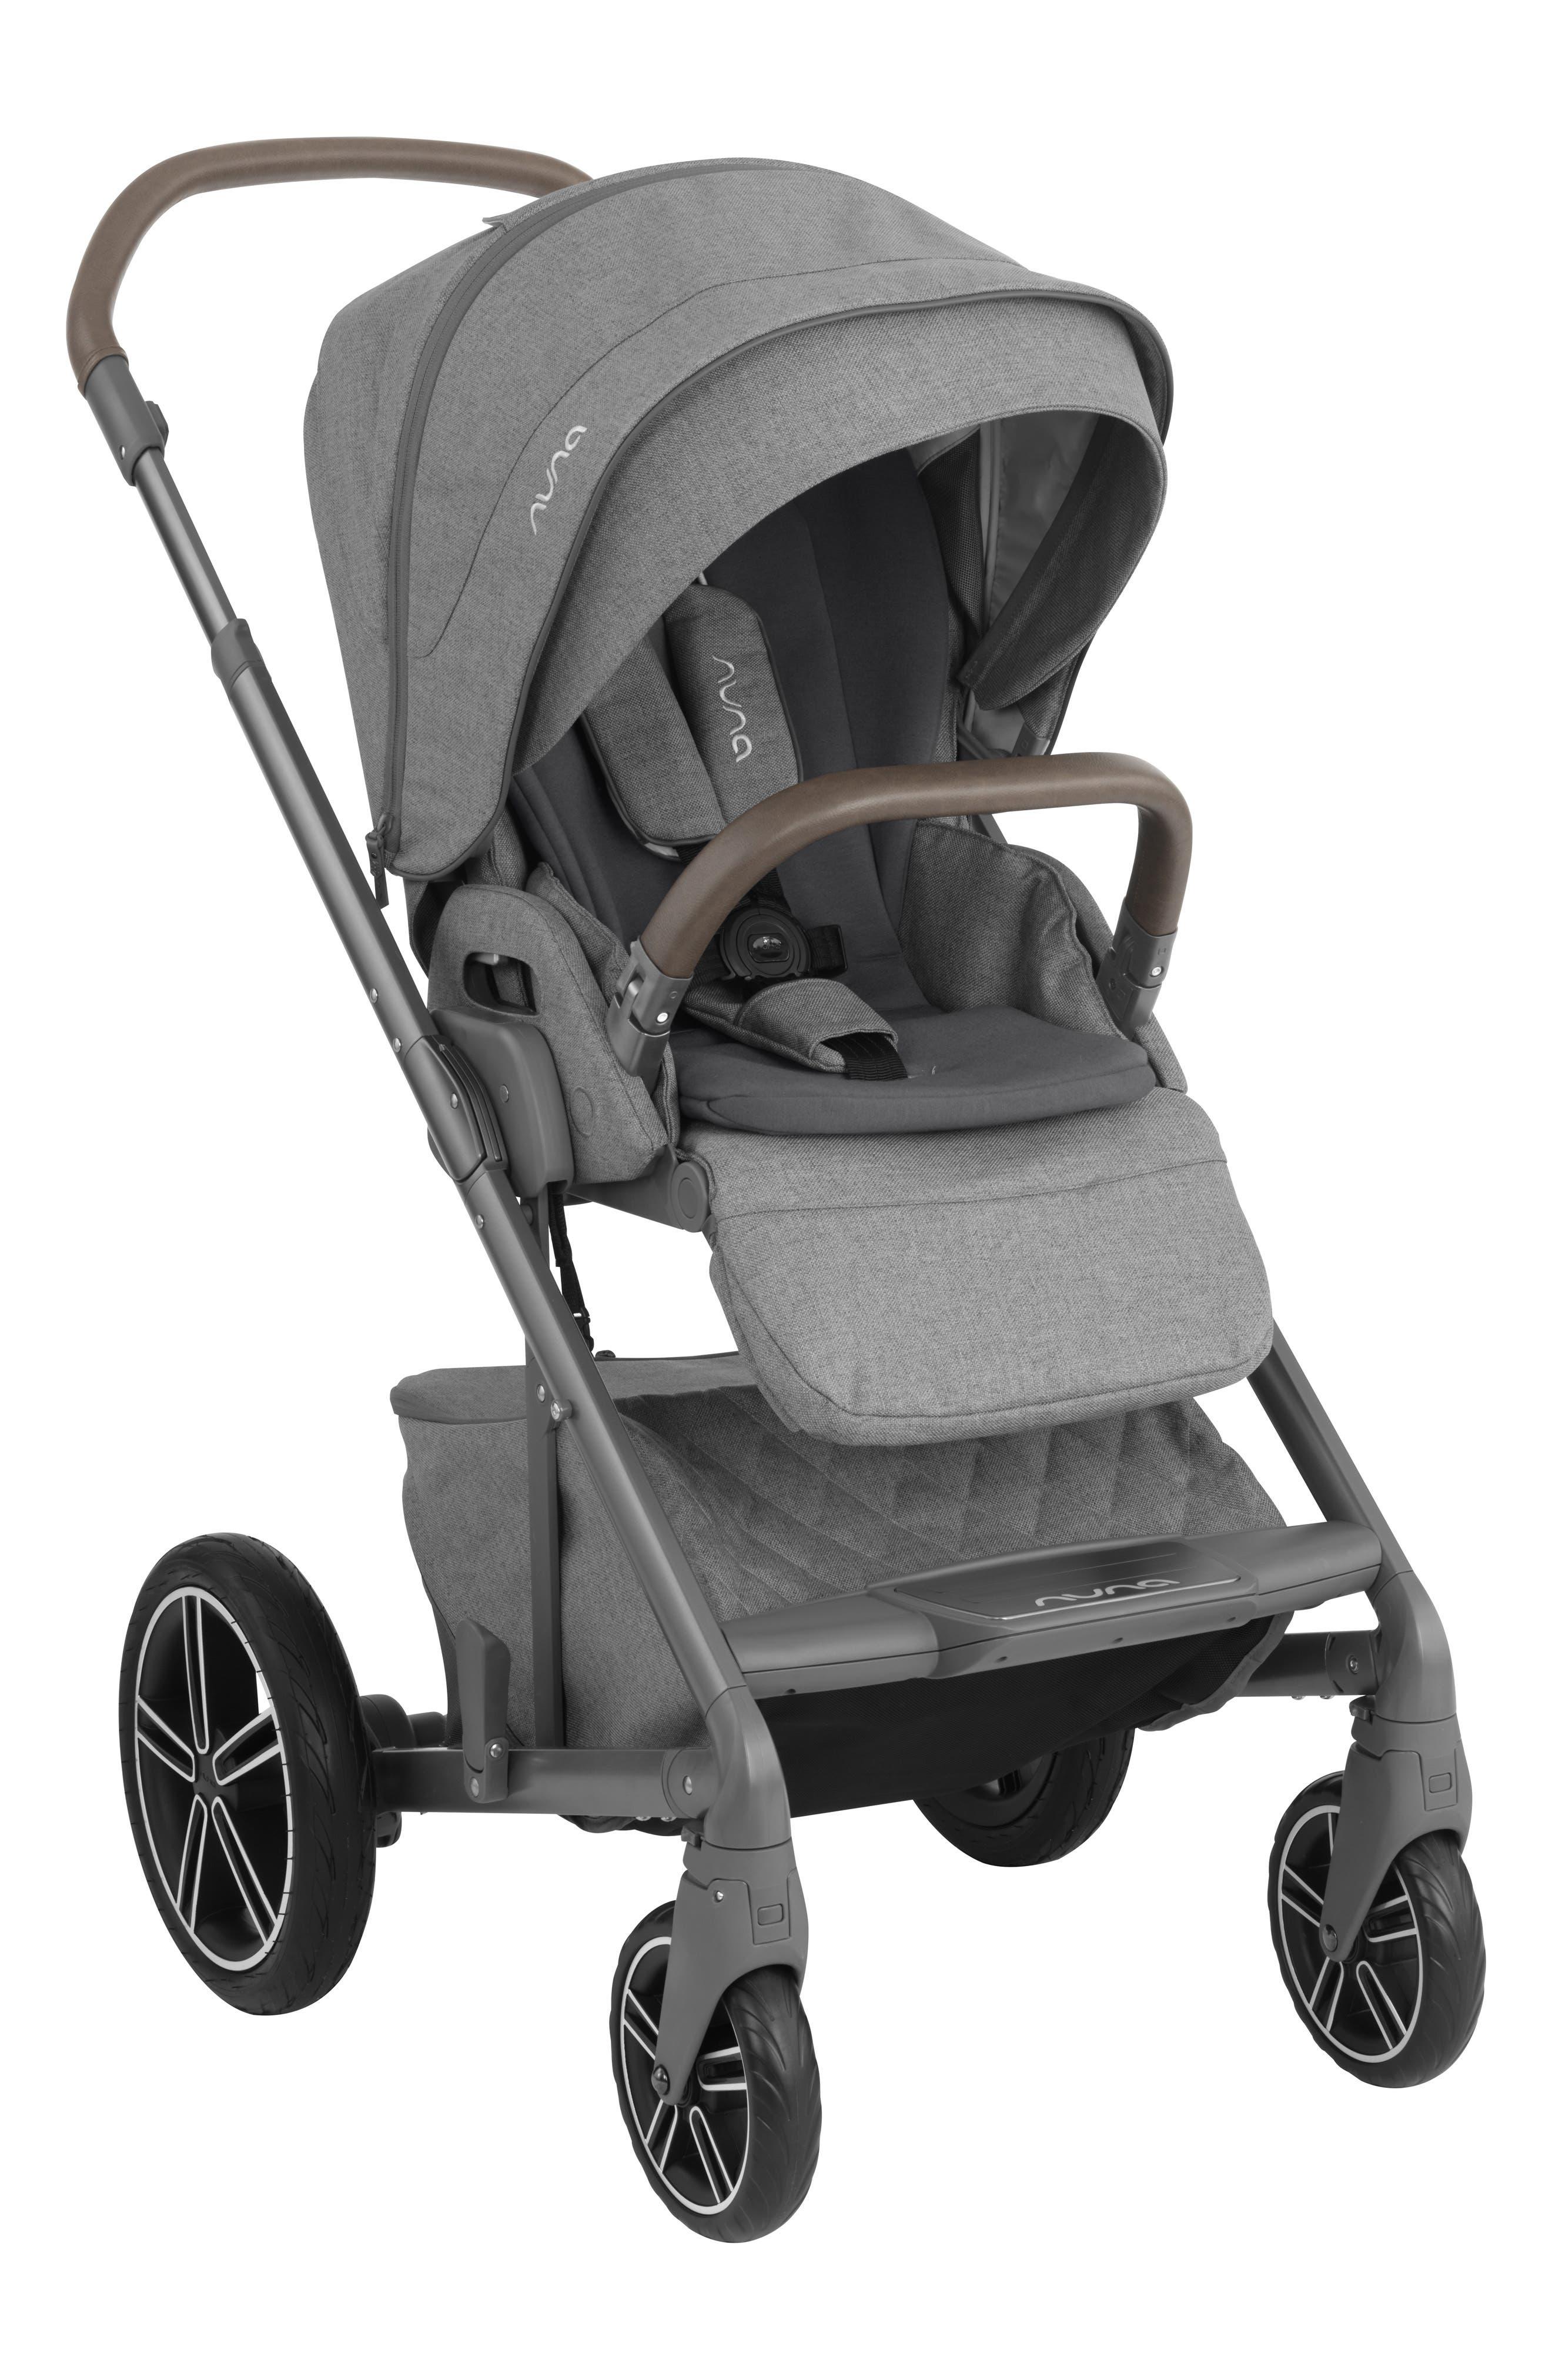 Nuna MIXX Baby Stroller